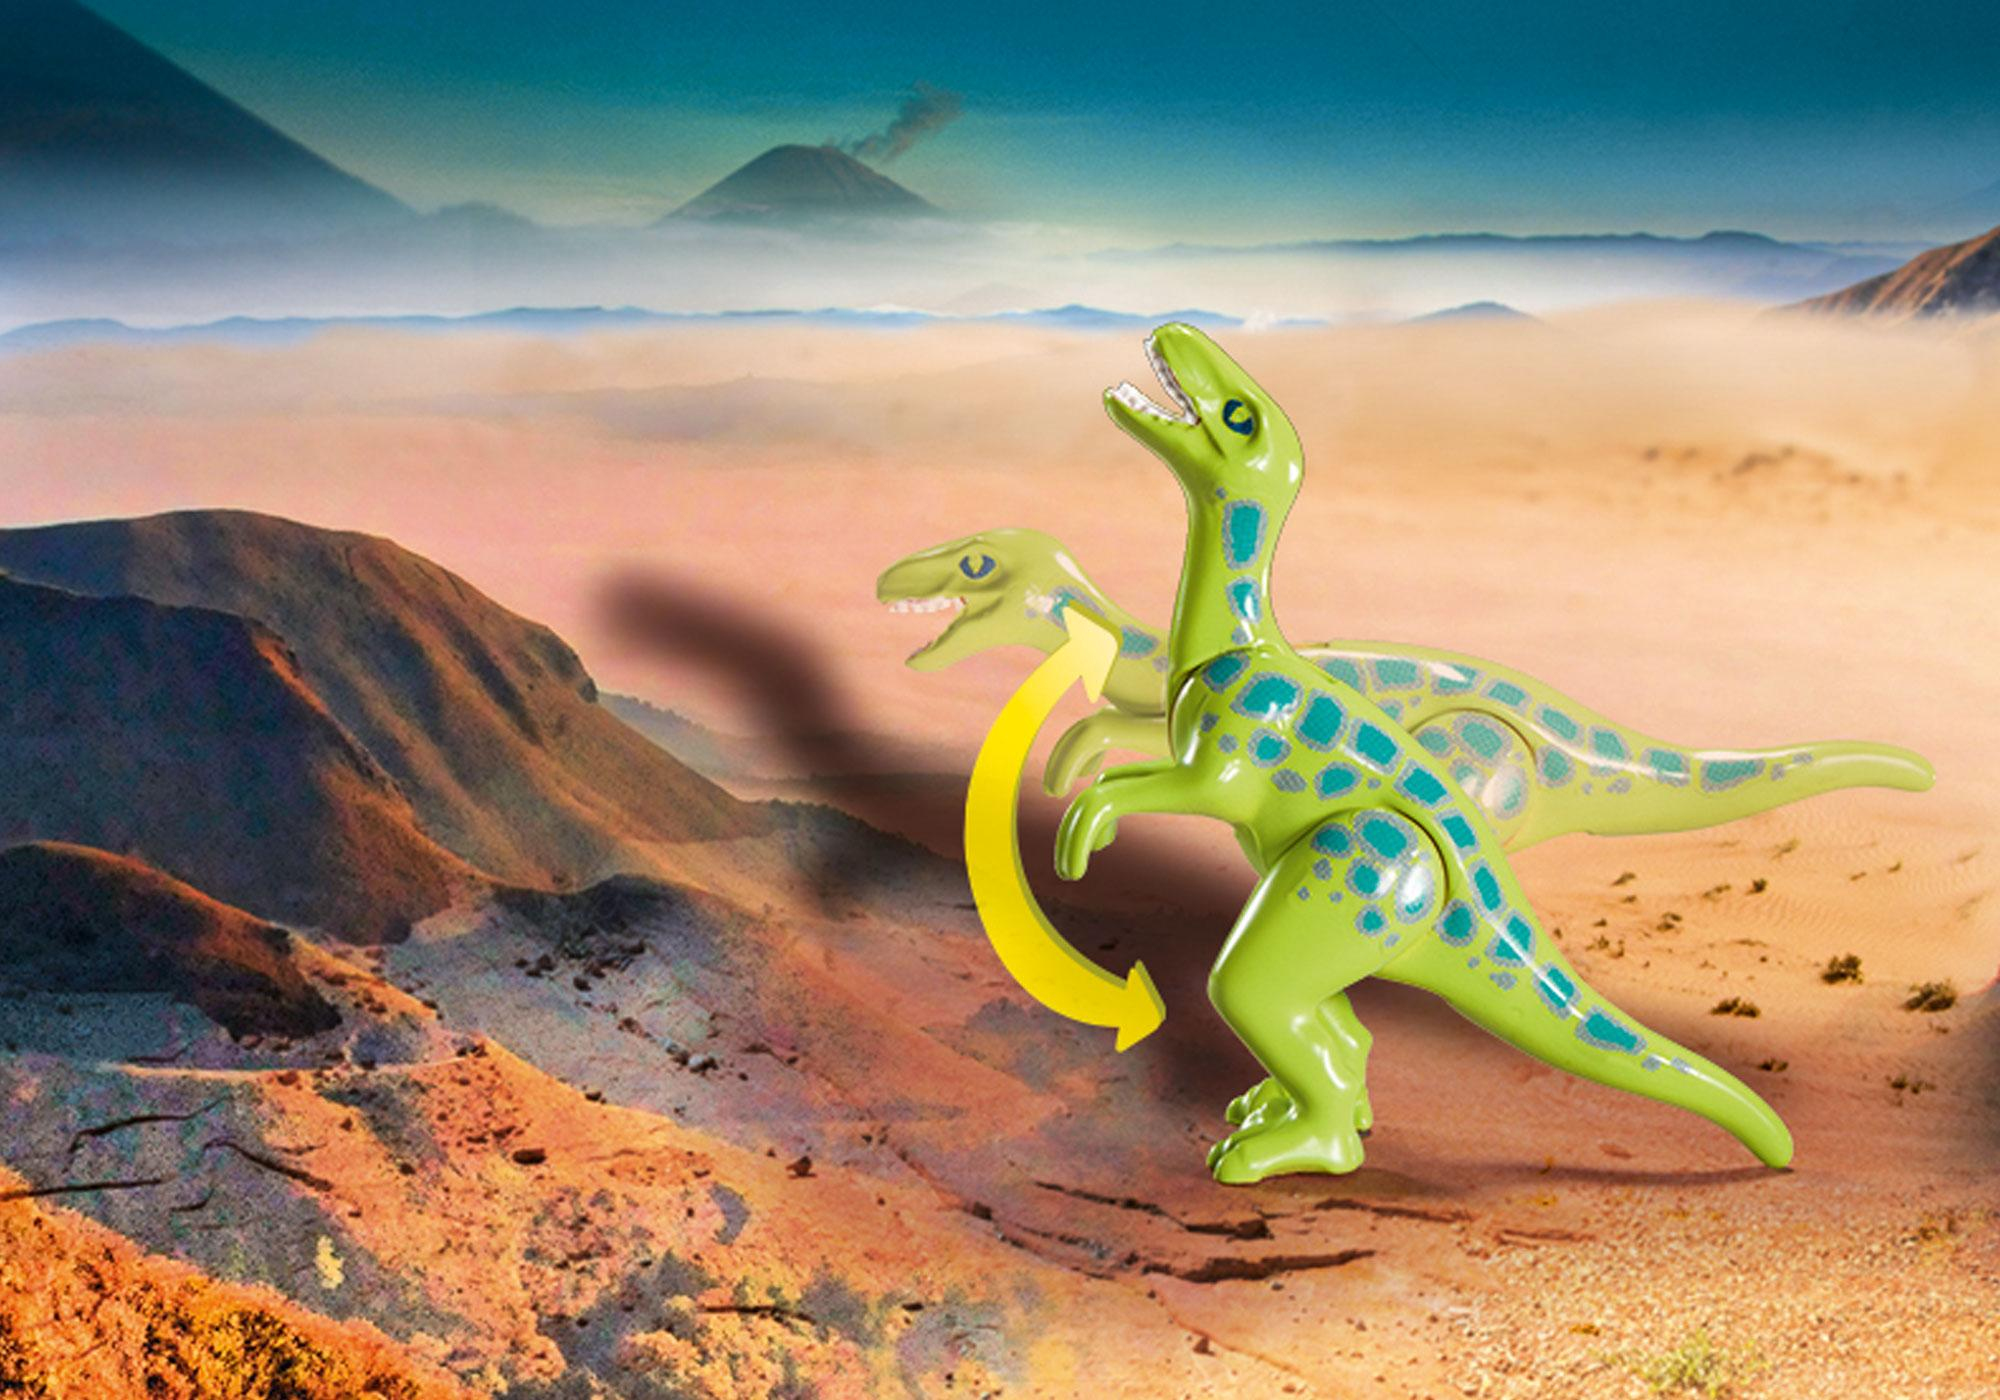 Playmobil 70108 Large Dino Explorer Carry Case 18PC Playset